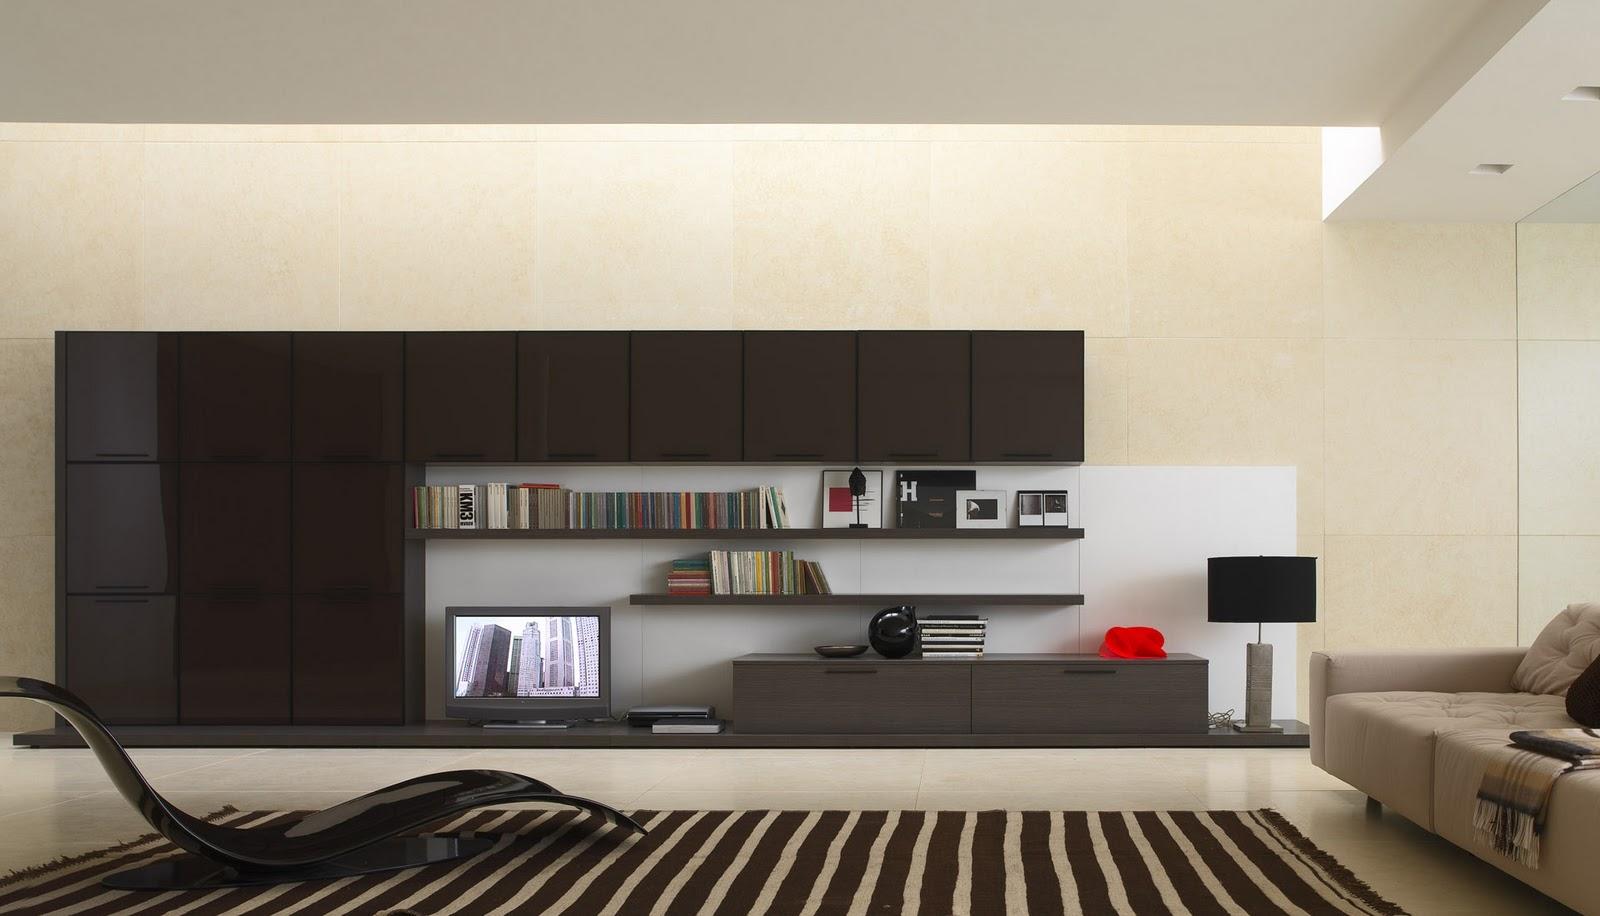 fotos de muebles de melamina para salas, fotos Alibaba - fotos de muebles de melamina para sala